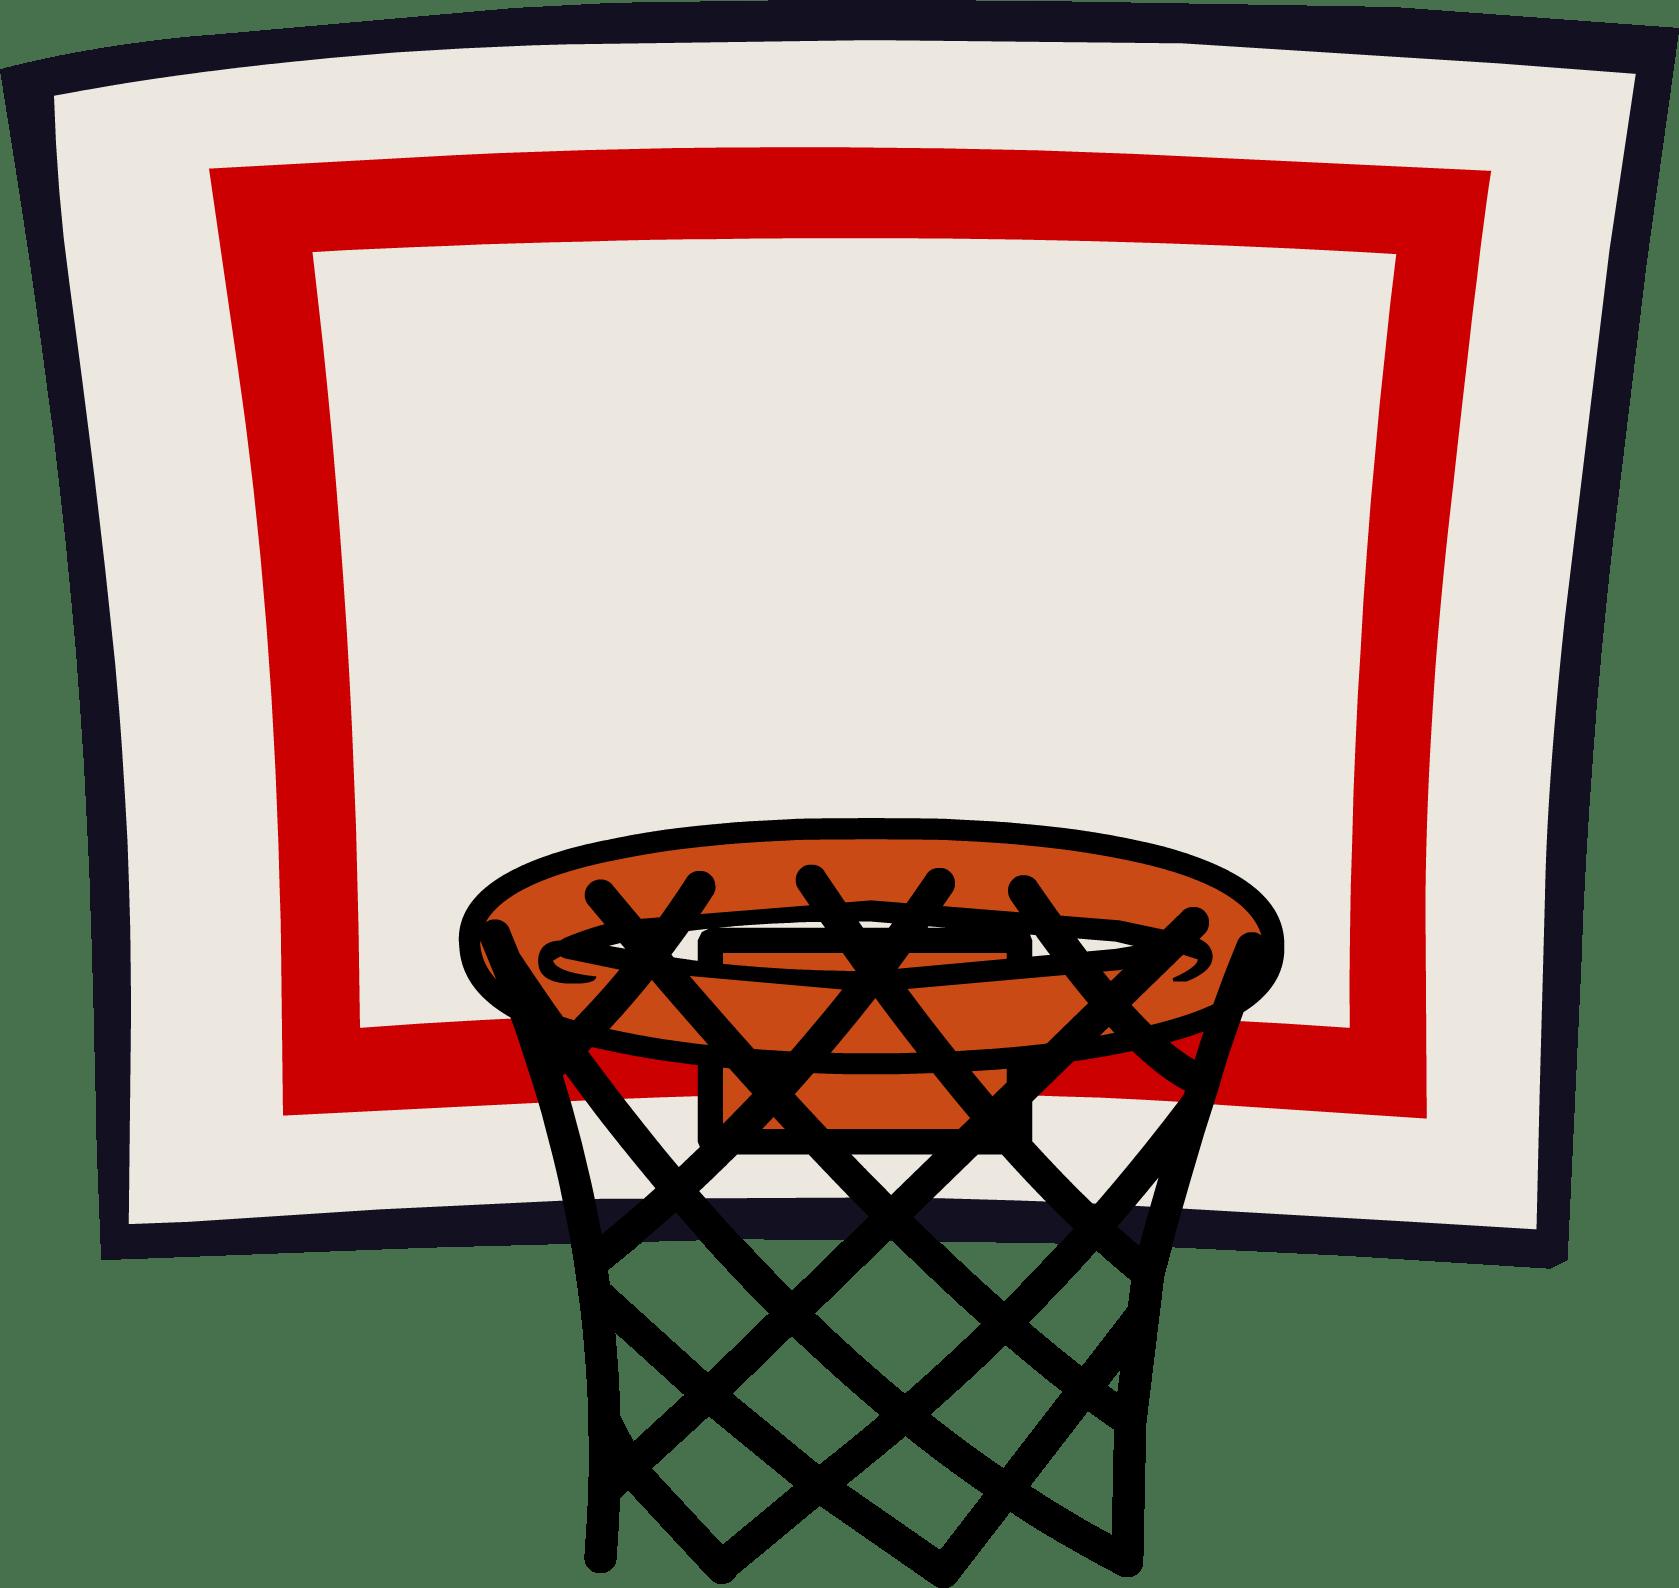 Basketball Net PNG